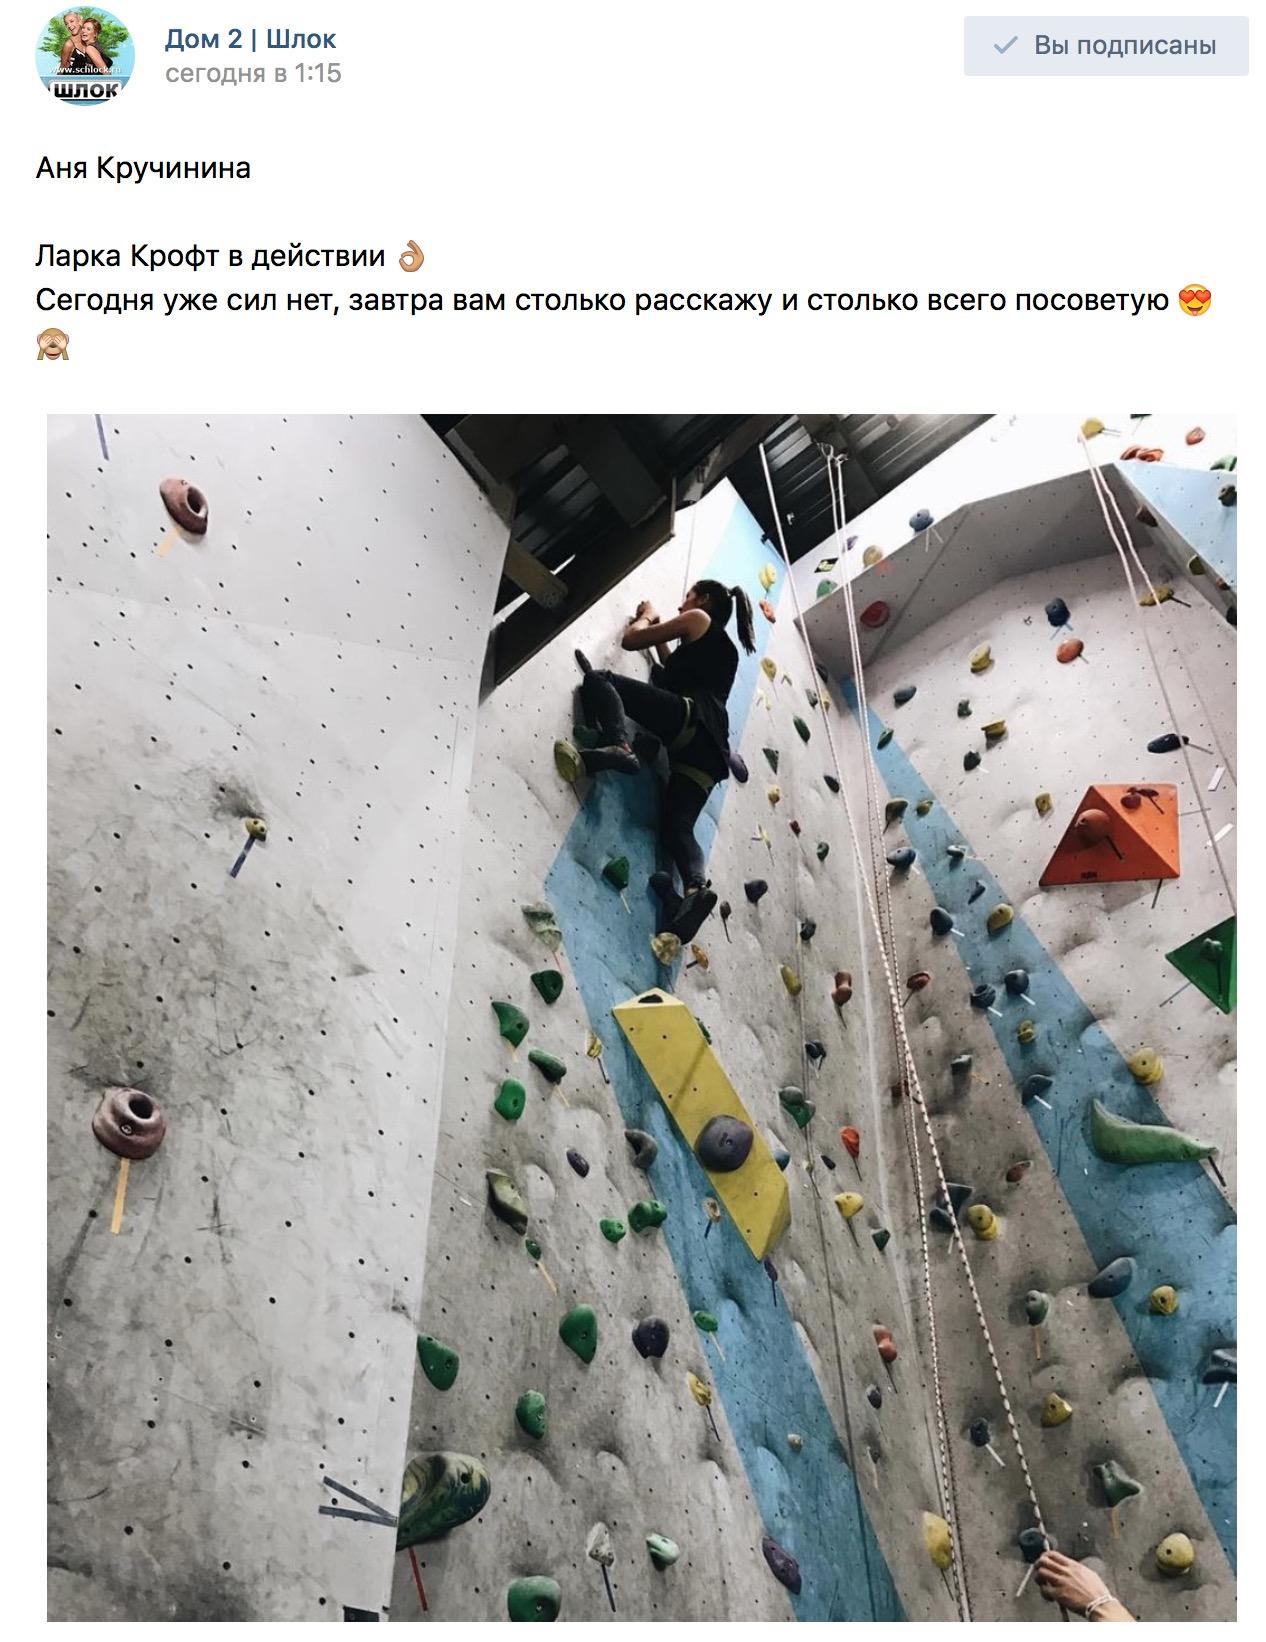 Аня Кручинина покоряет вершину